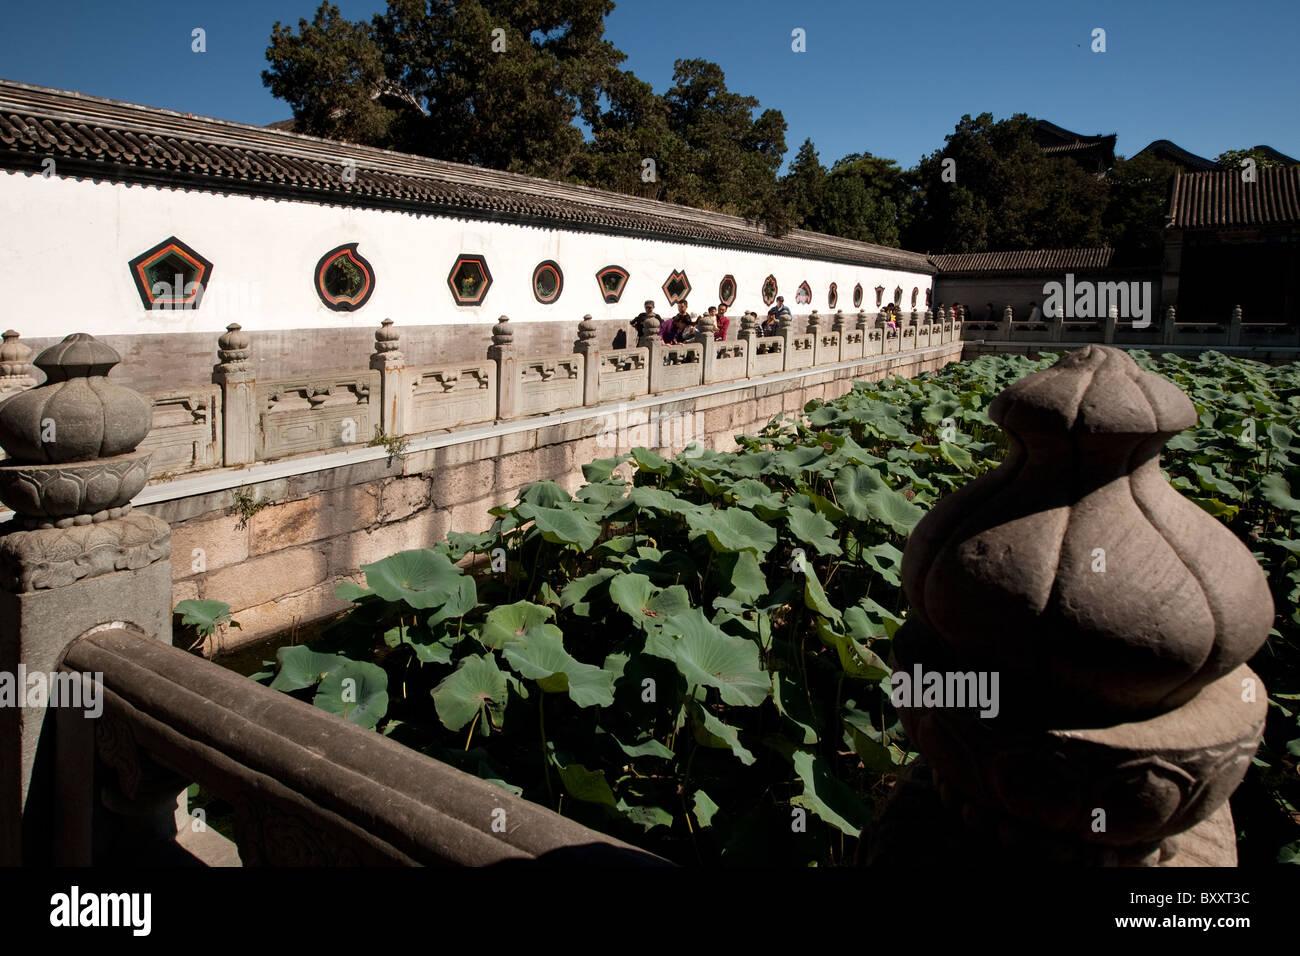 Yiheyuan = Garden of Restful Peace = Summer Palace + Kunming Lake Beijing China - Stock Image